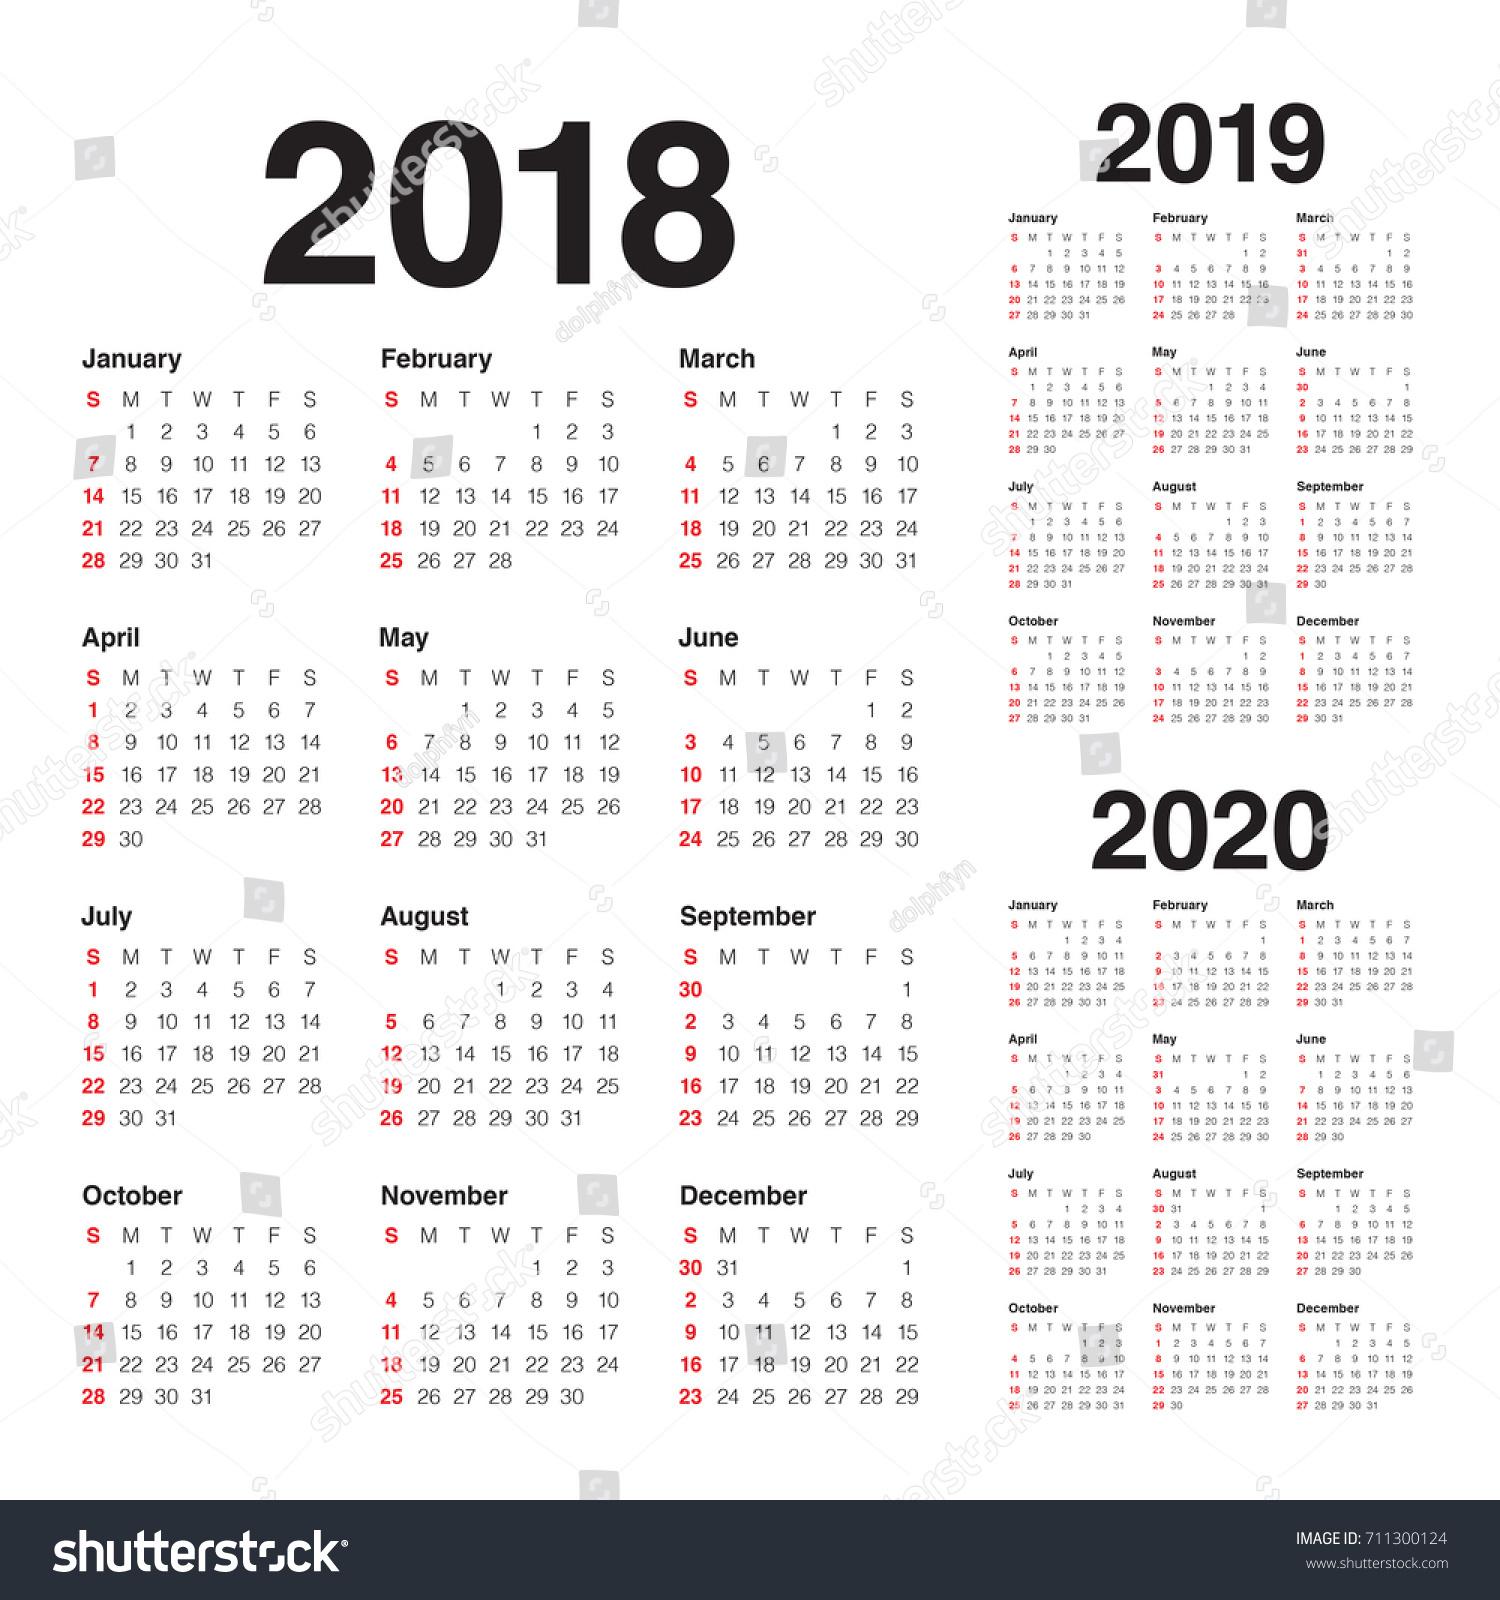 year 2018 2019 2020 calendar vector stock vector 711300124 shutterstock. Black Bedroom Furniture Sets. Home Design Ideas